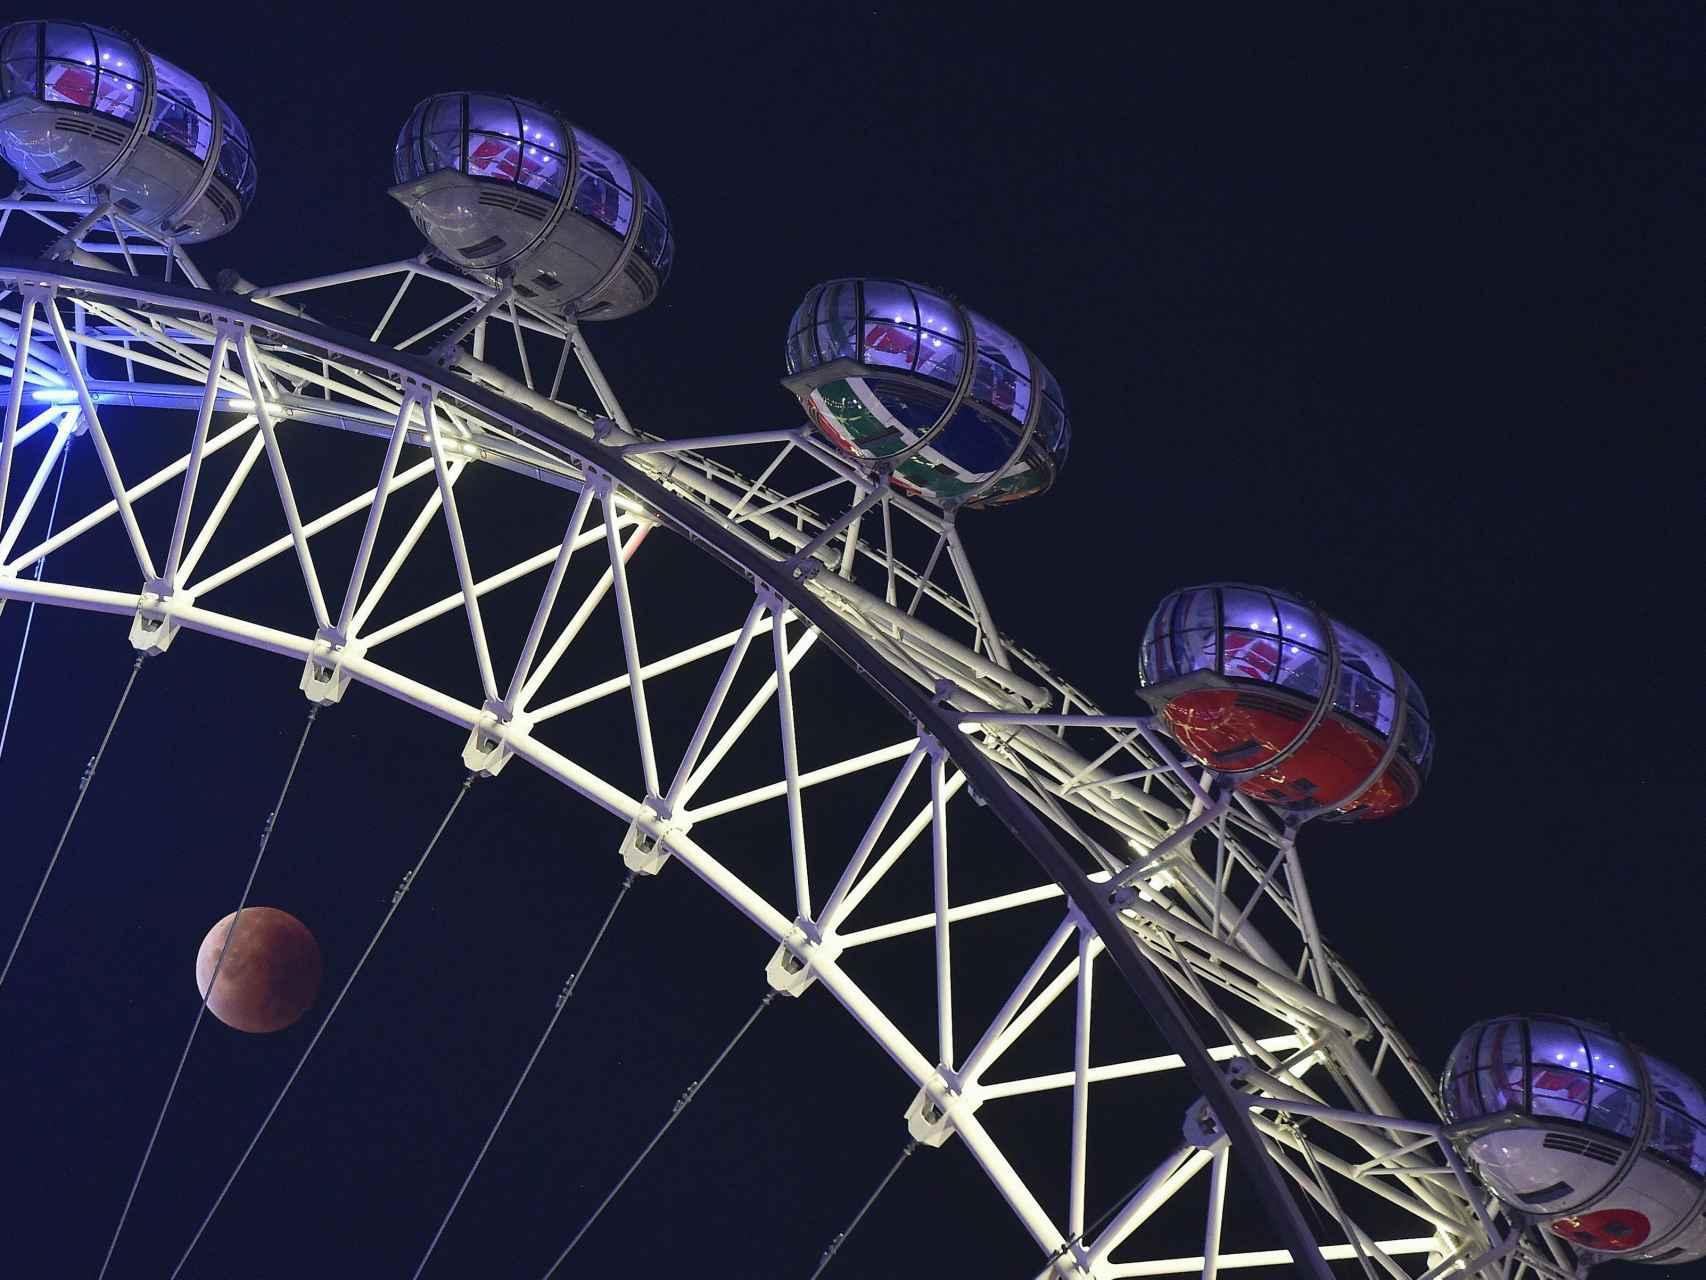 La luna a través de la noria London Eye.